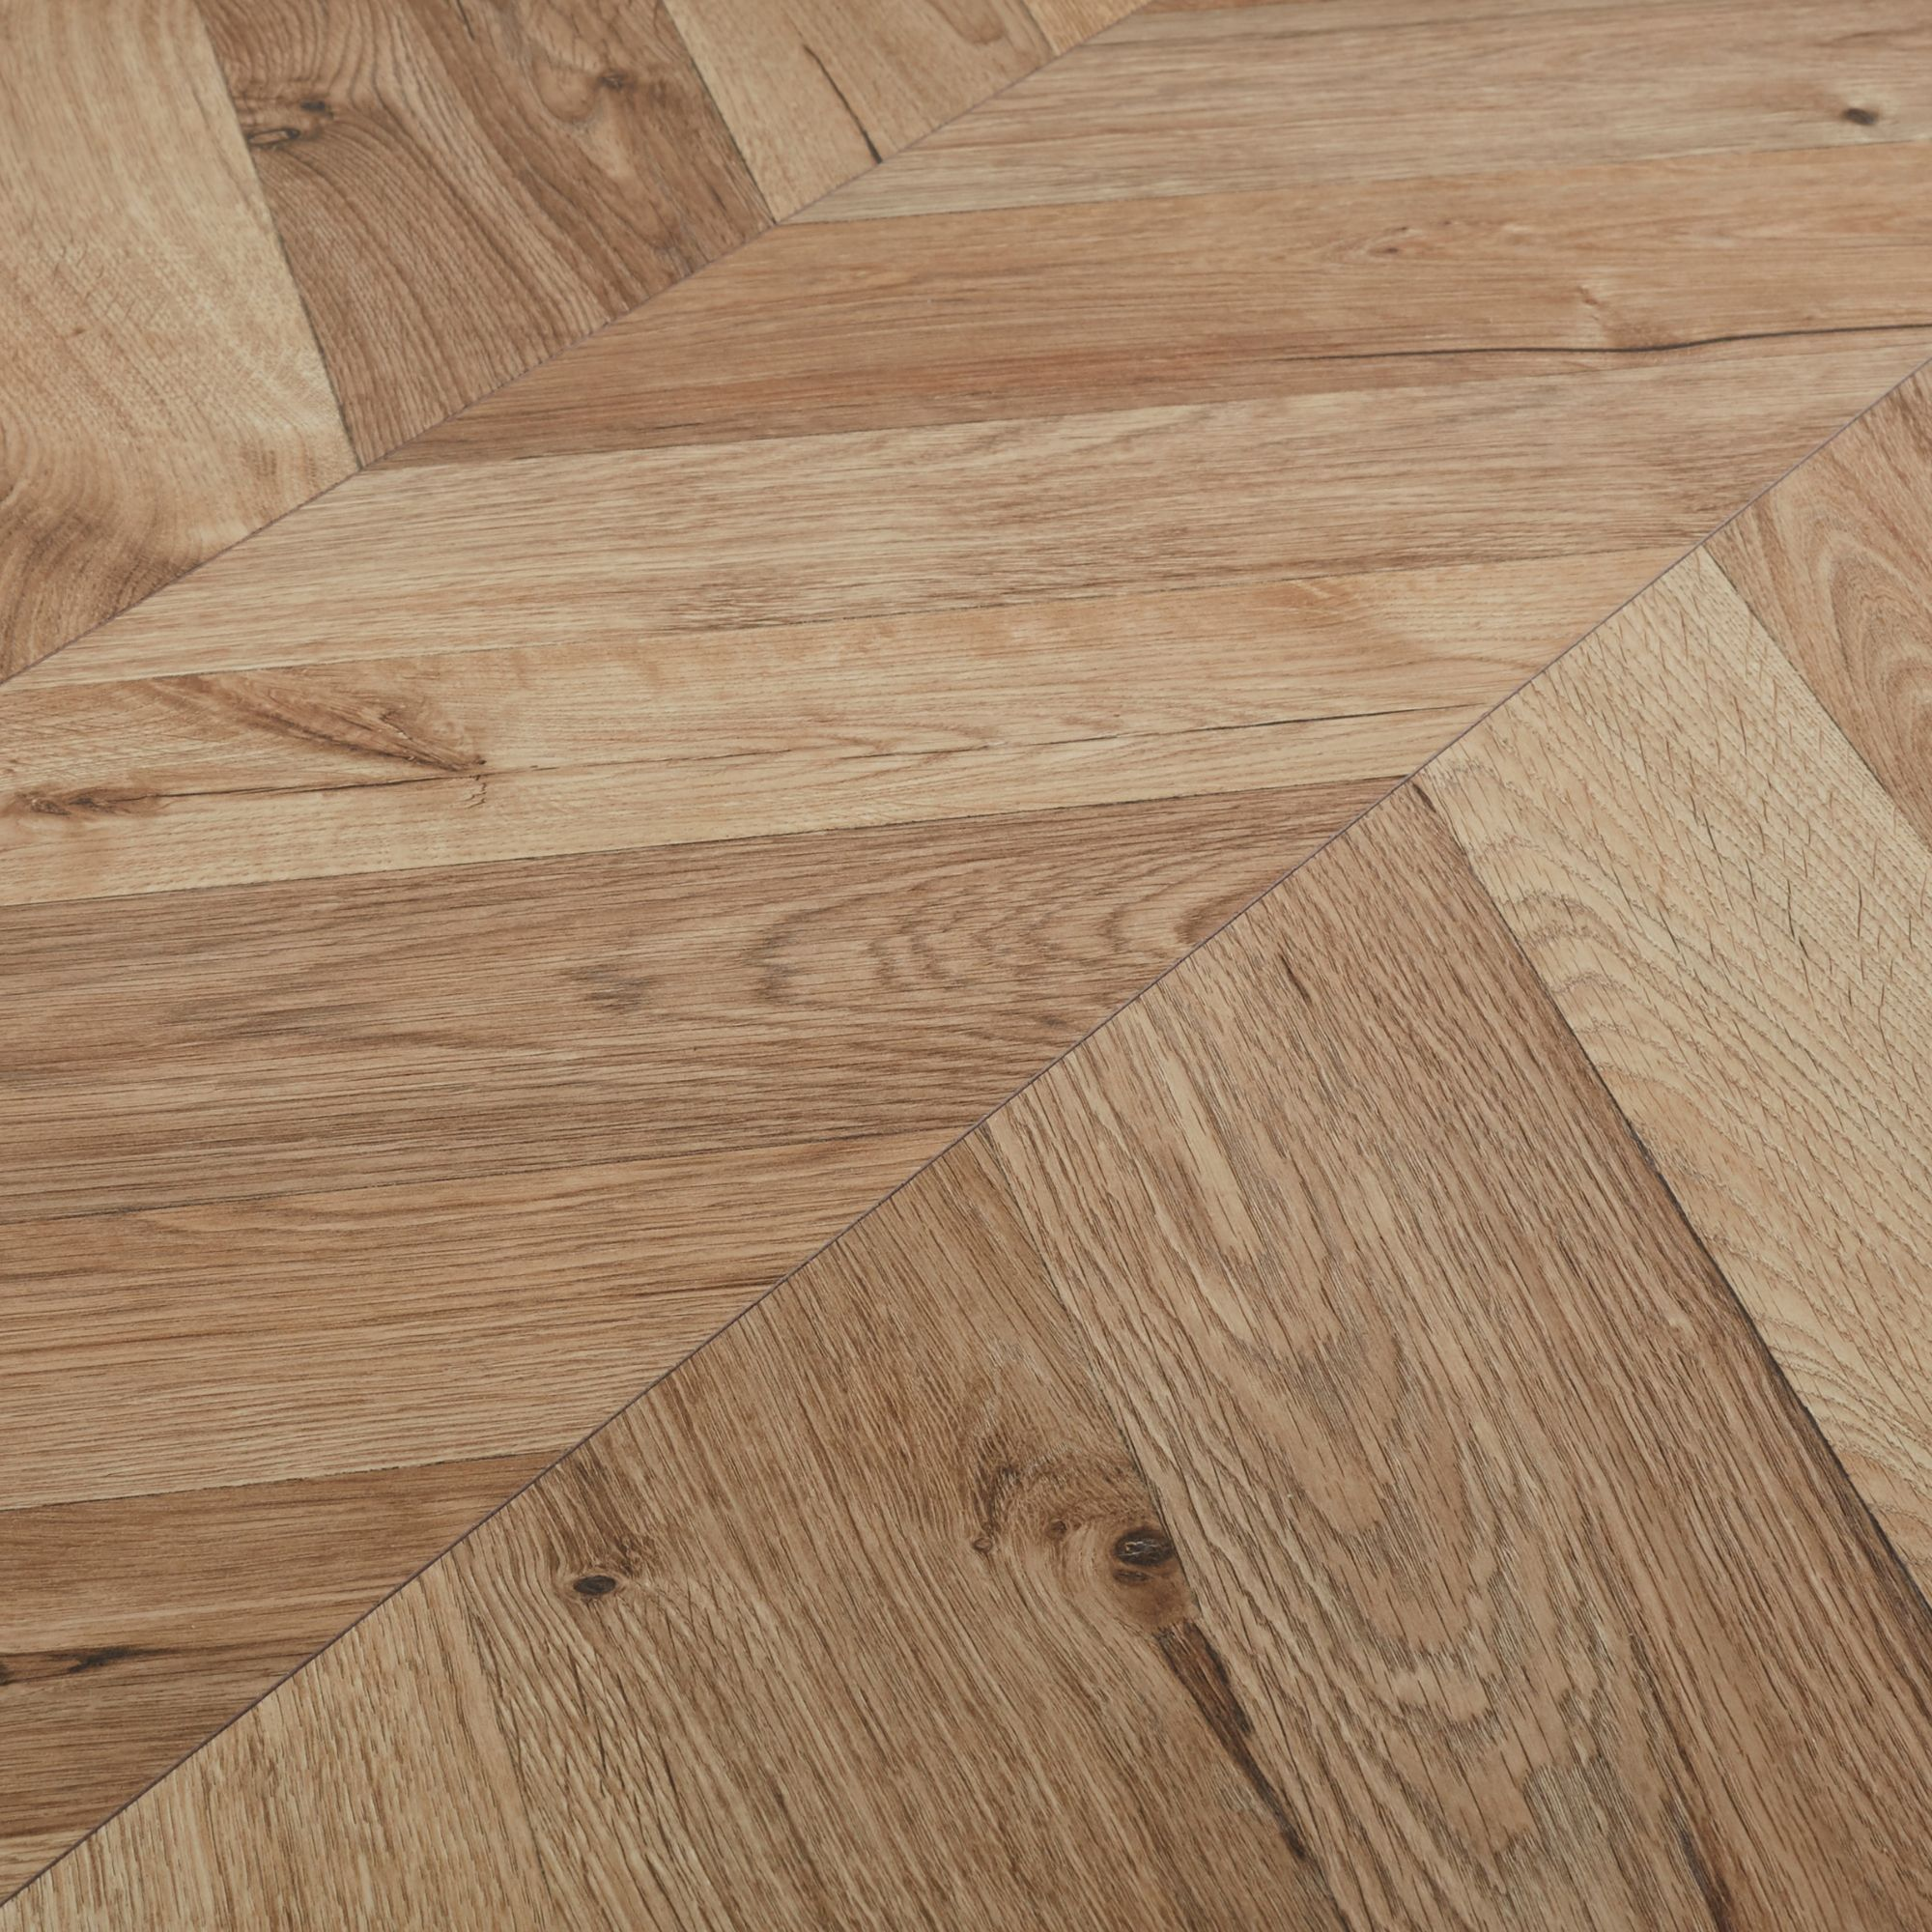 GoodHome Heanor Natural Oak effect Laminate flooring, 2.7m² Pack ...